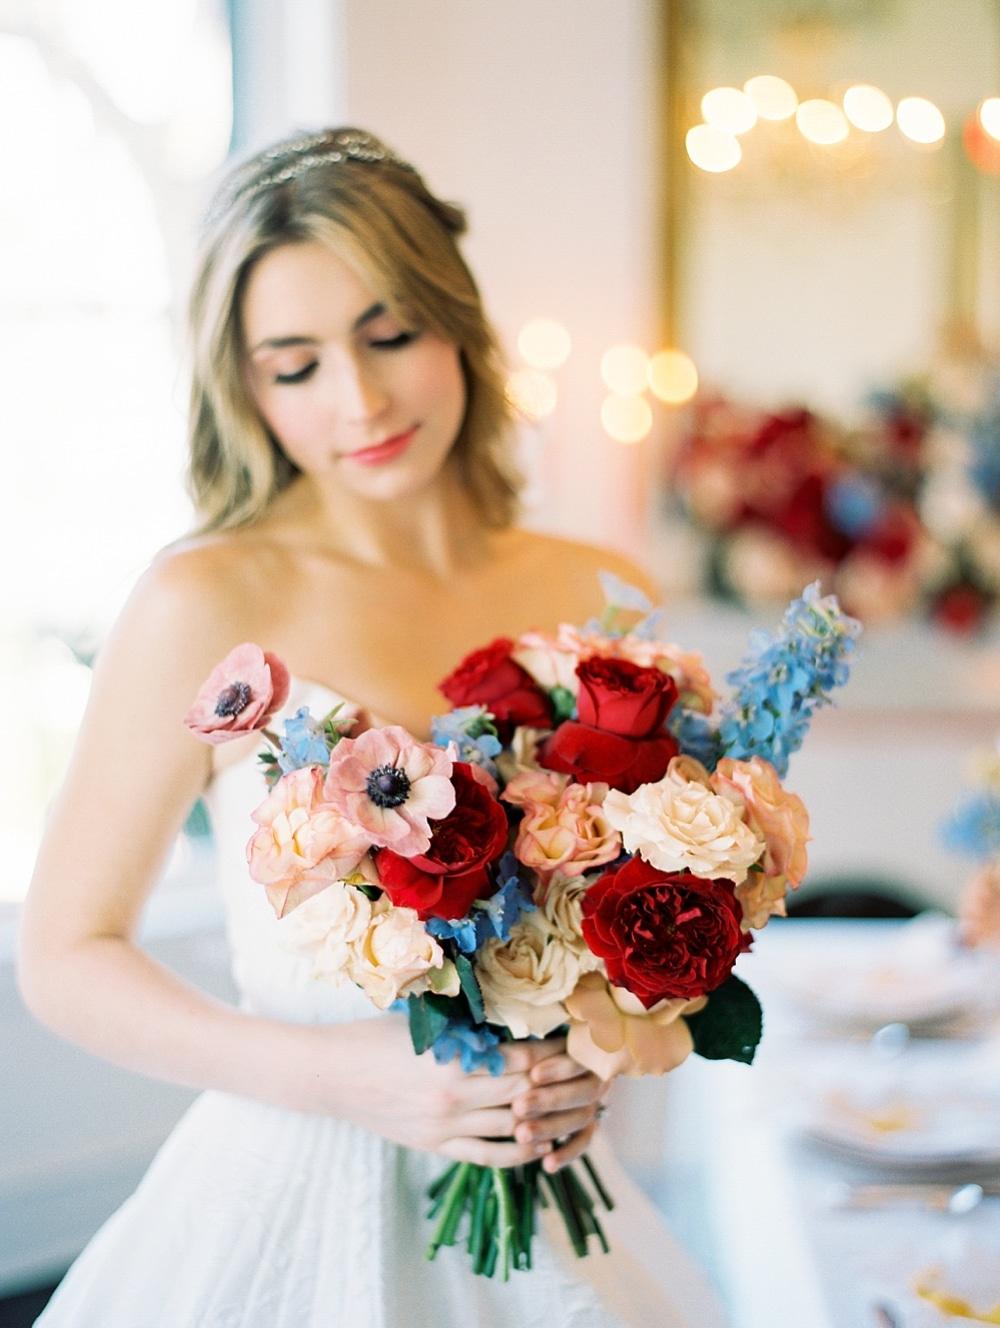 kristin-la-voie-photography-austin-wedding-photographer-woodbine-mansion-126